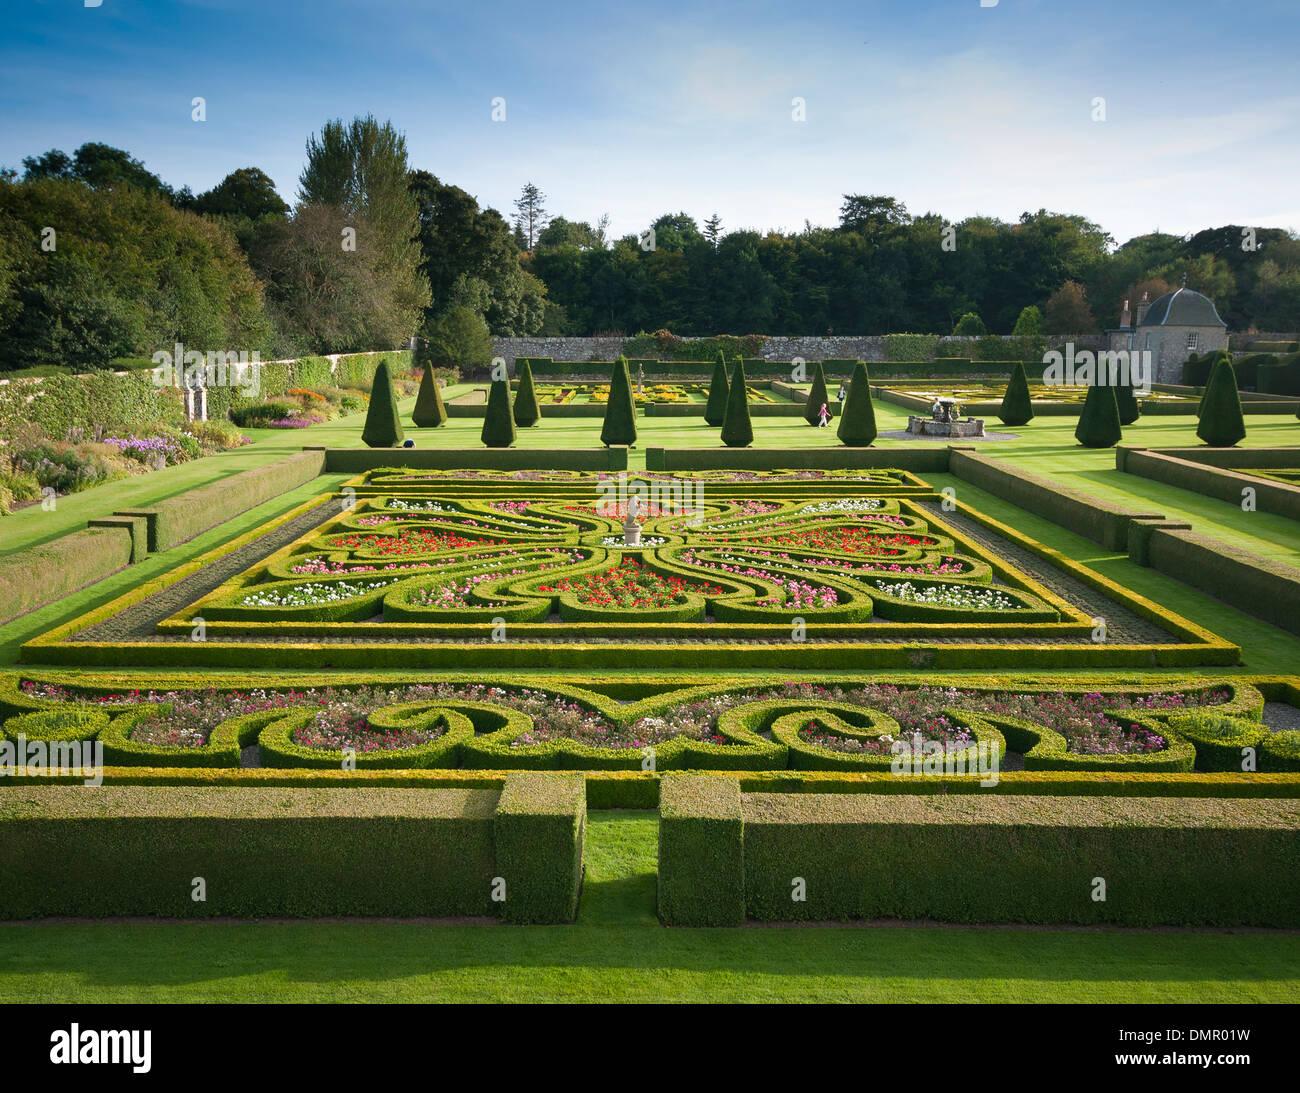 National Trust ecosse jardin formel pitmedden Photo Stock